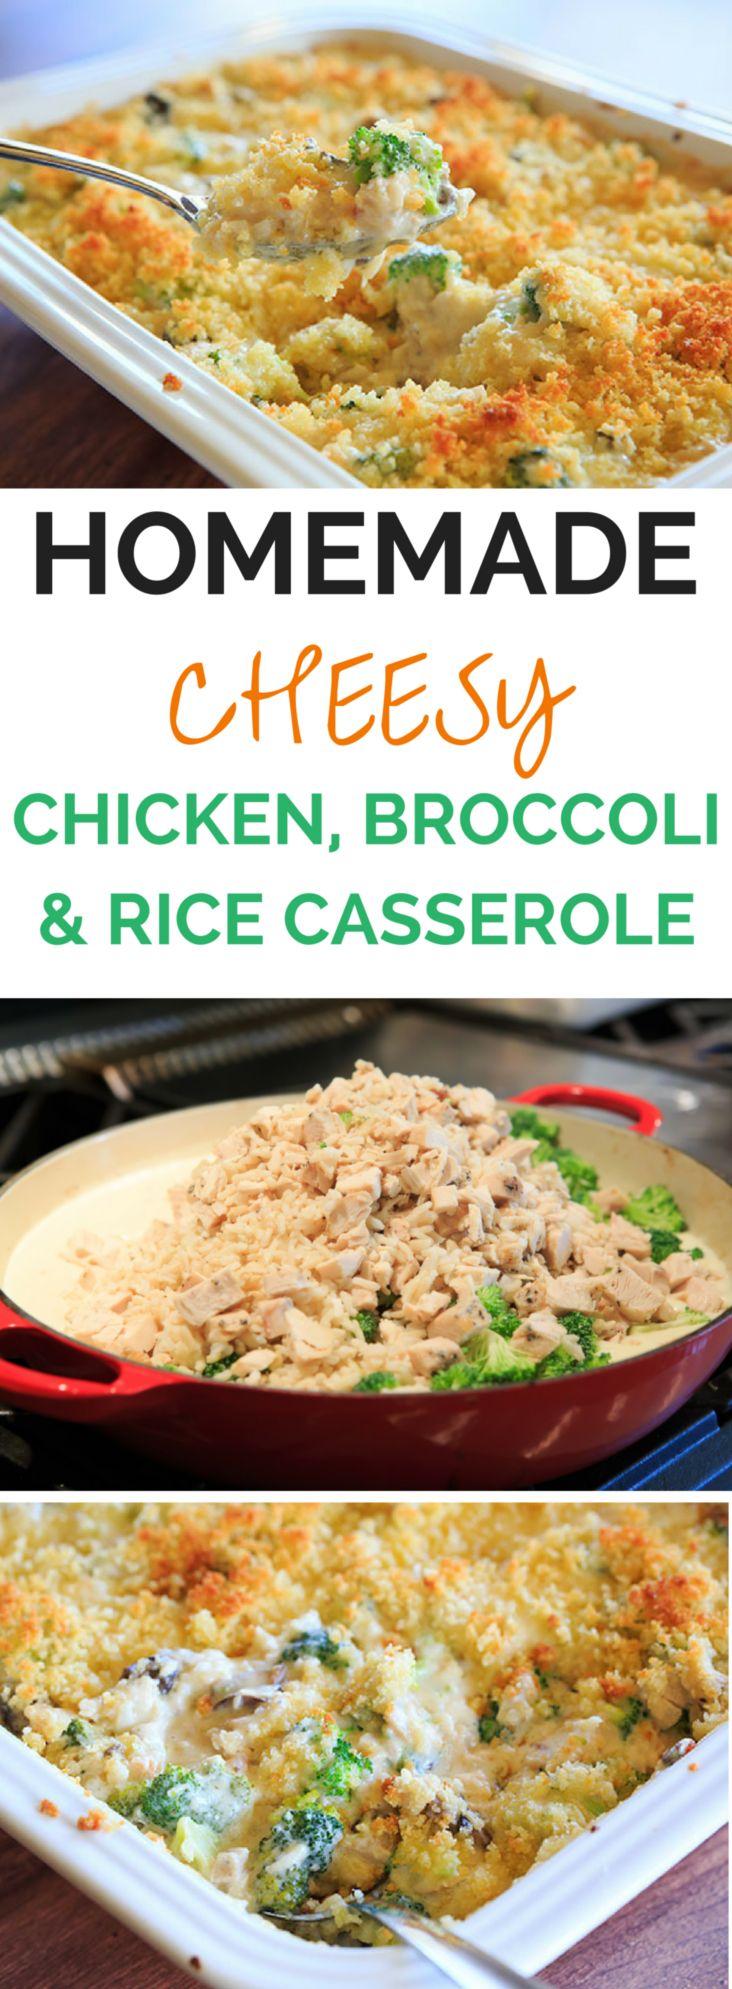 Cheesy Chicken, Broccoli  Rice Casserole From Scratch -1578